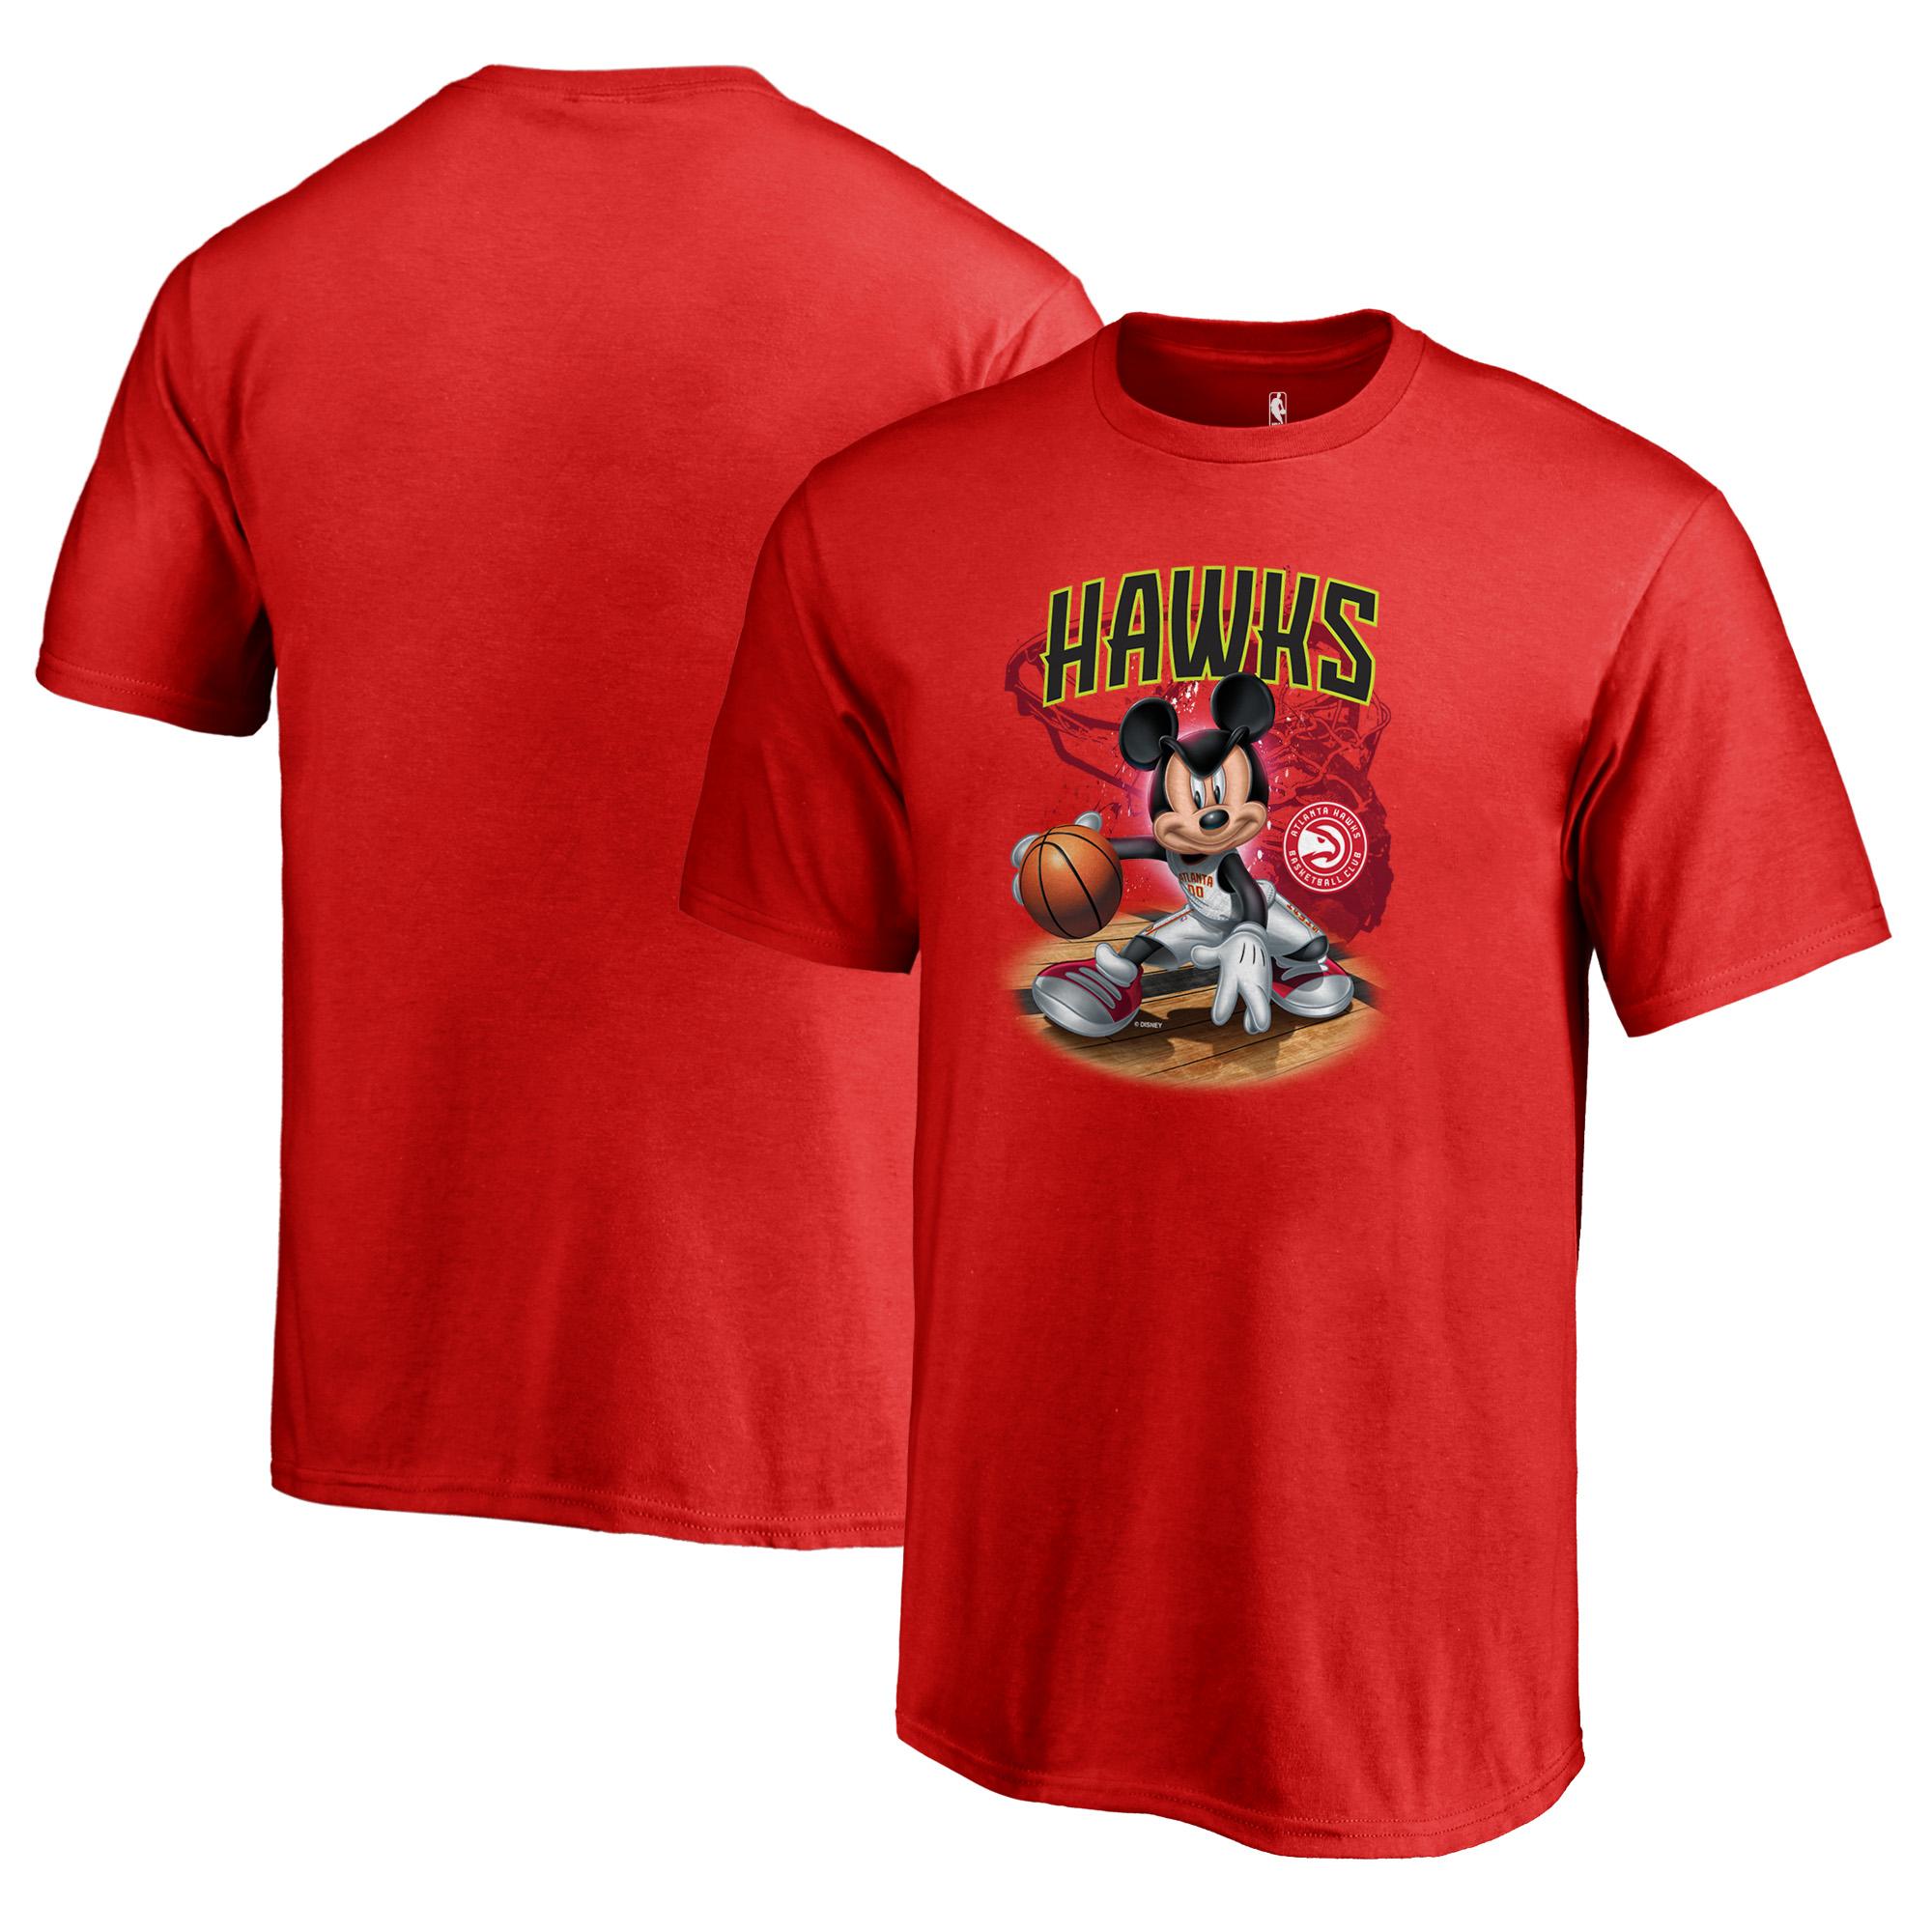 Atlanta Hawks Fanatics Branded Youth Disney NBA All-Star T-Shirt - Red